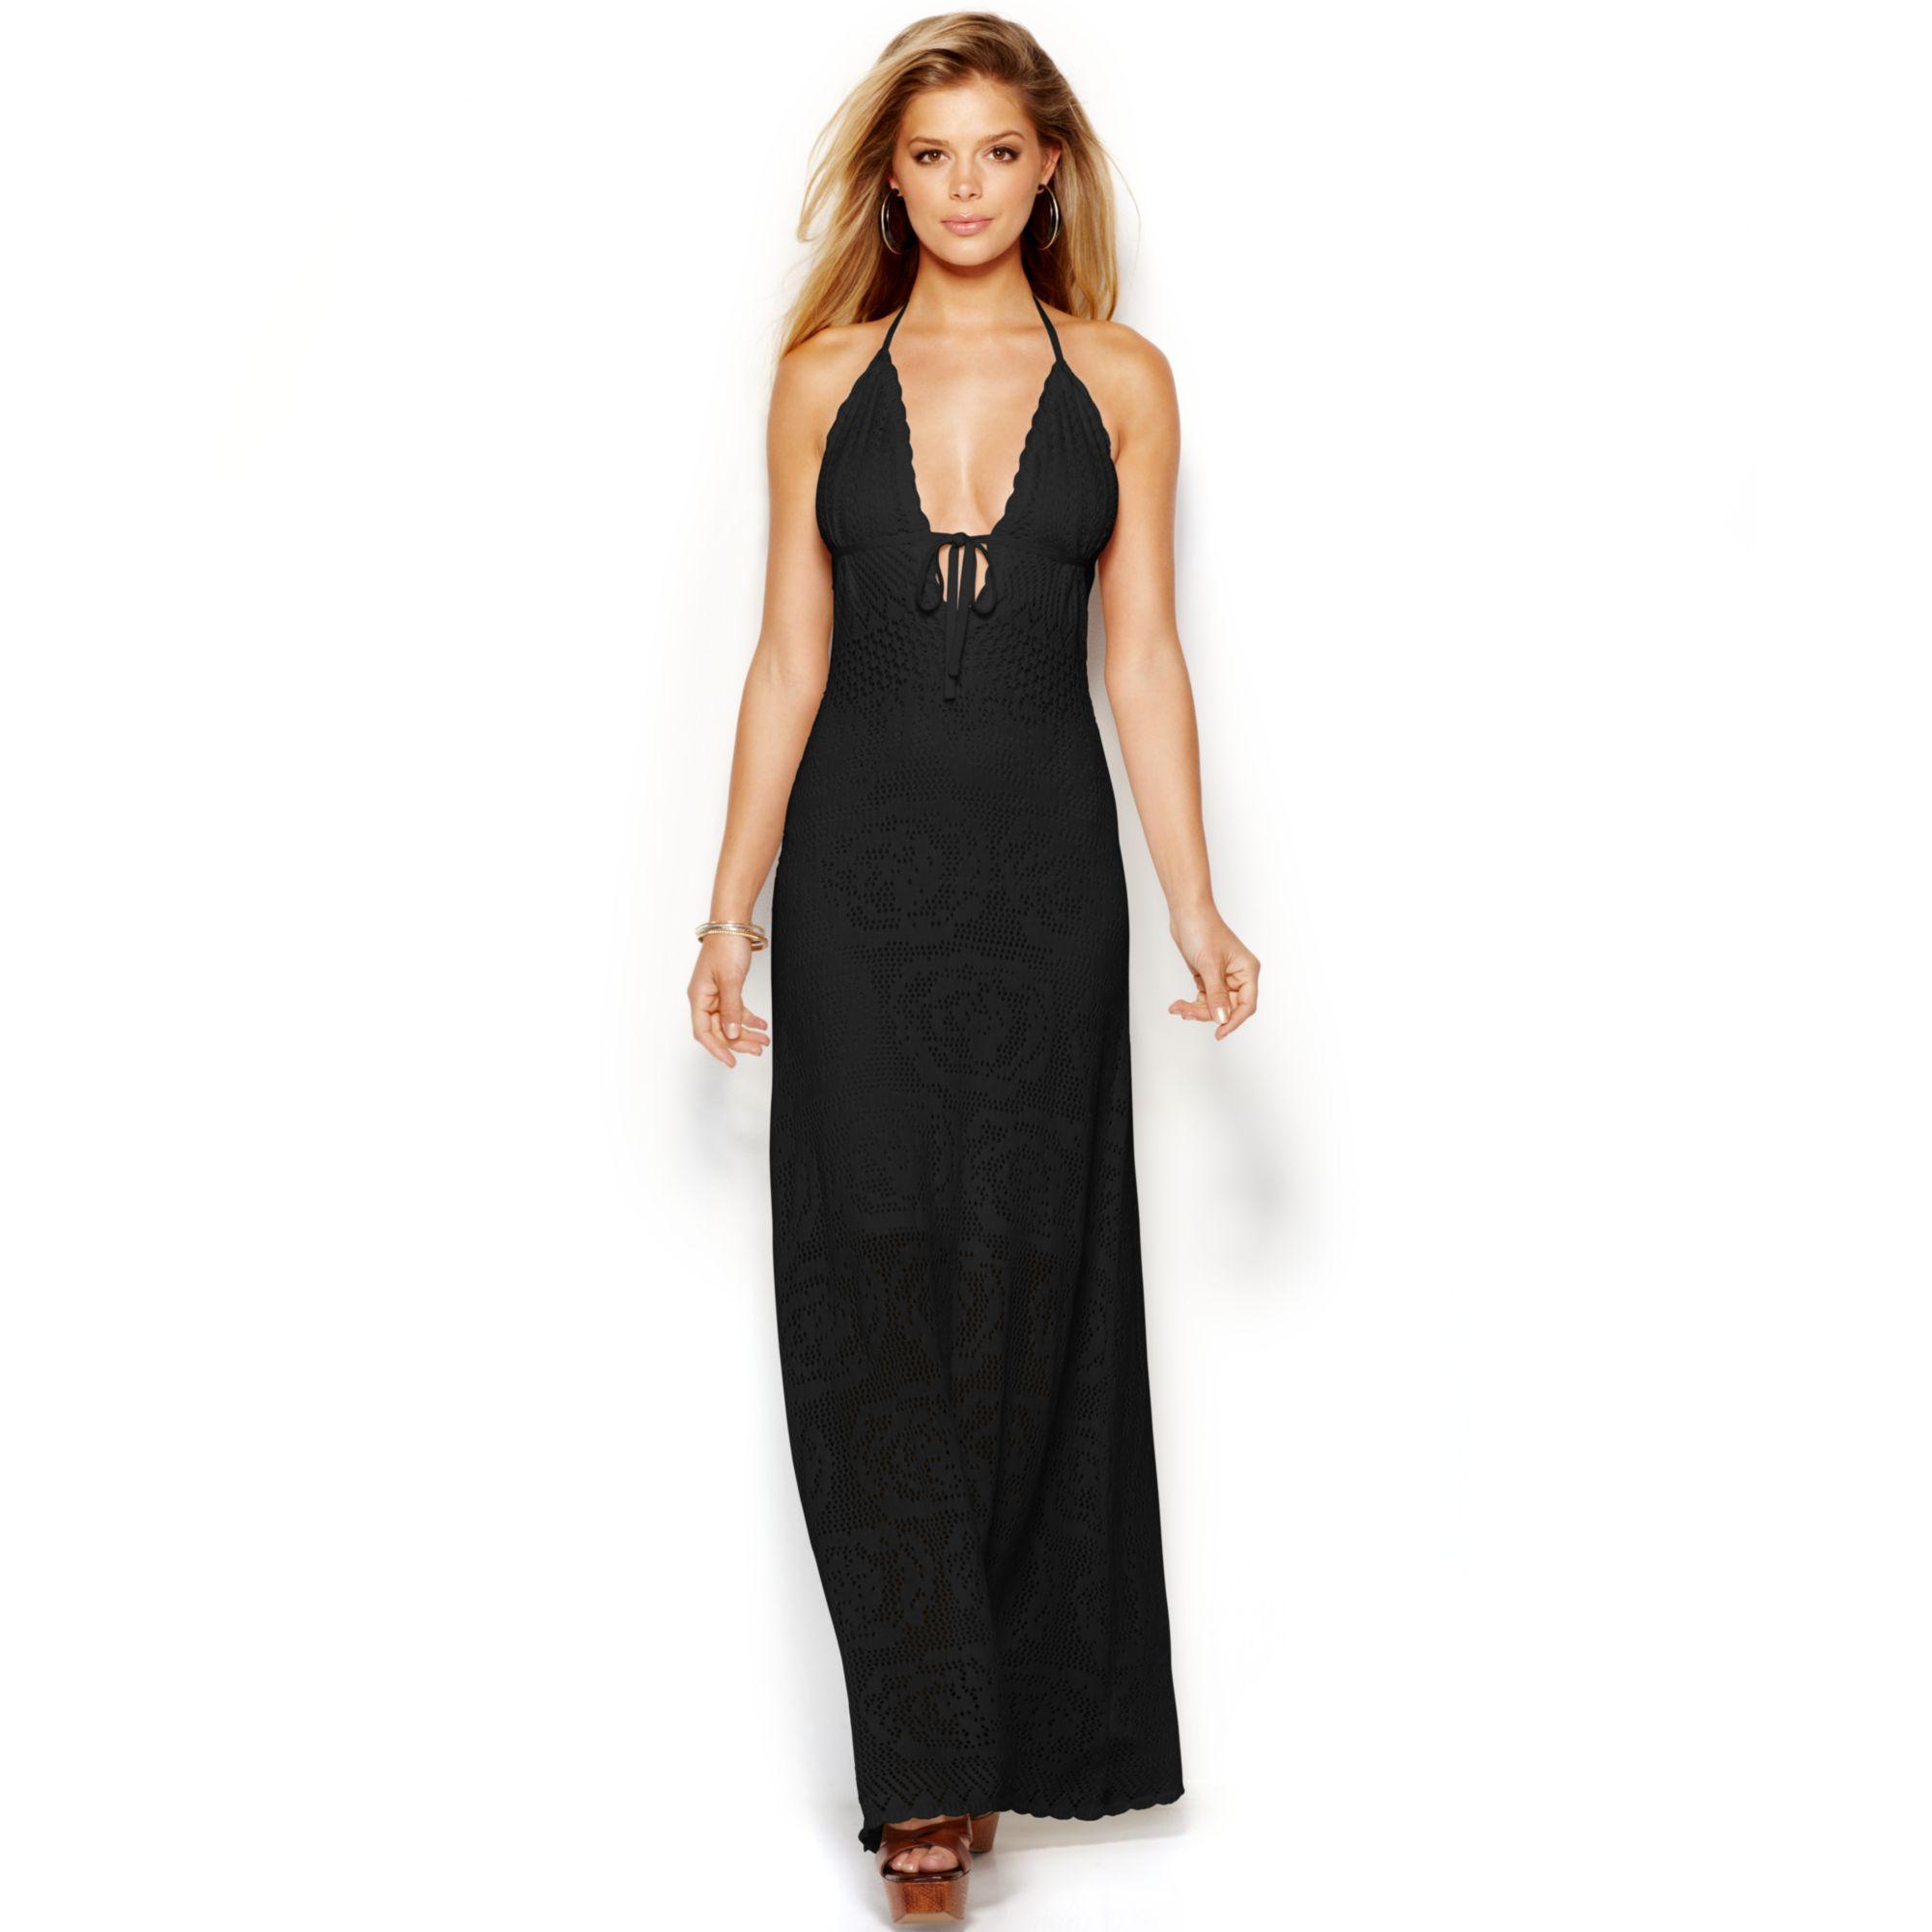 9829e4e9ffd9b Lyst - Guess Crochet Halter Maxi Dress in Black